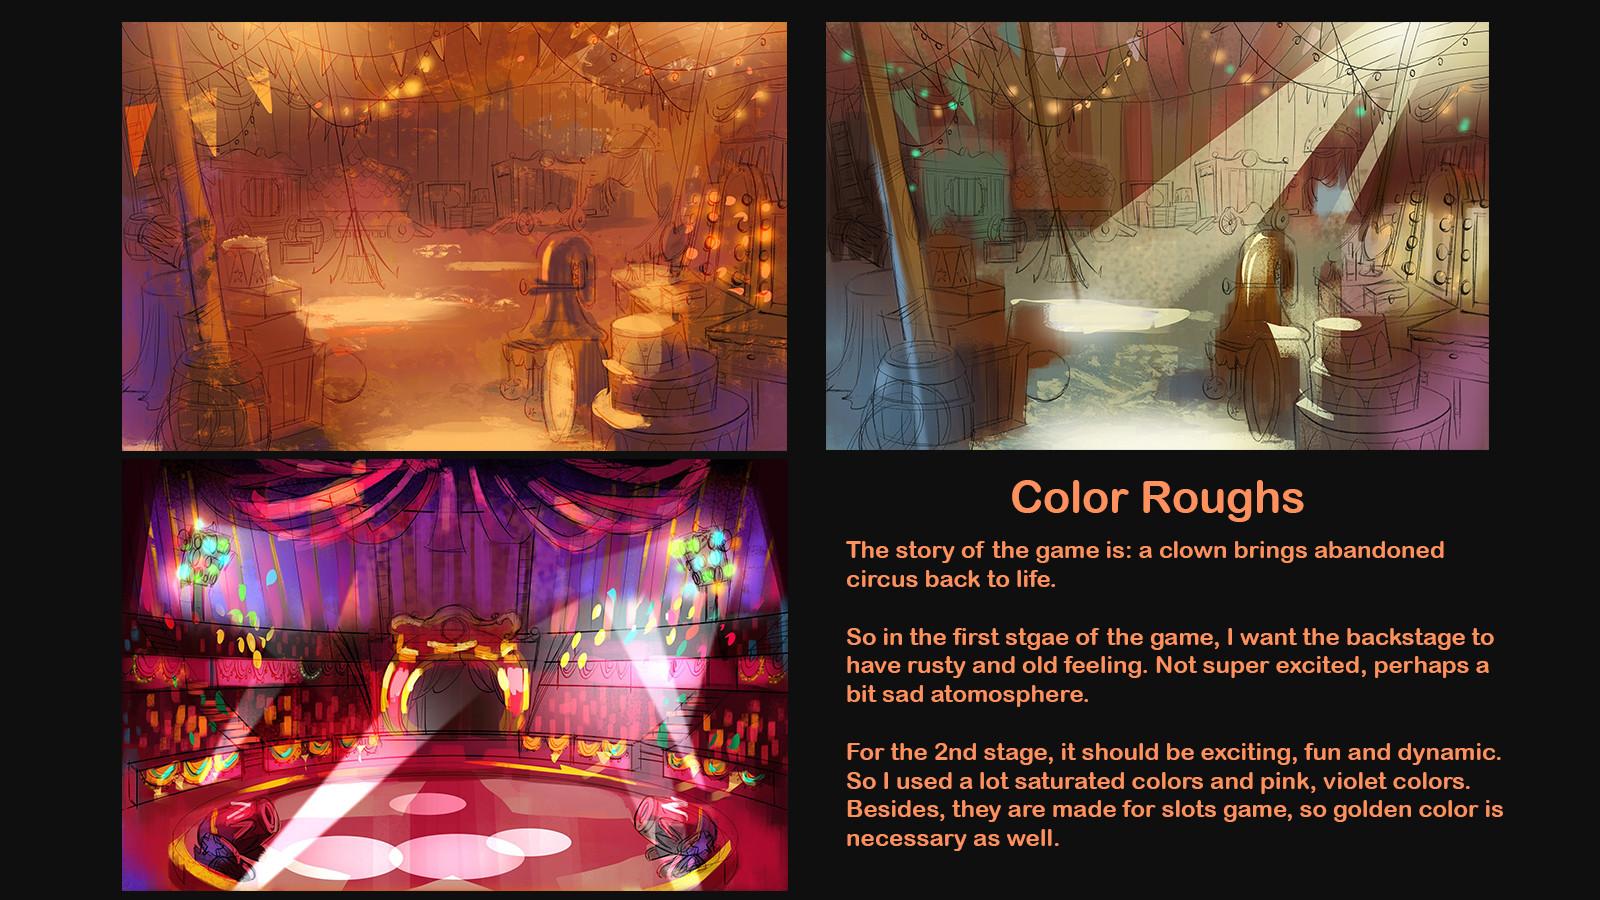 colorrough.jpg